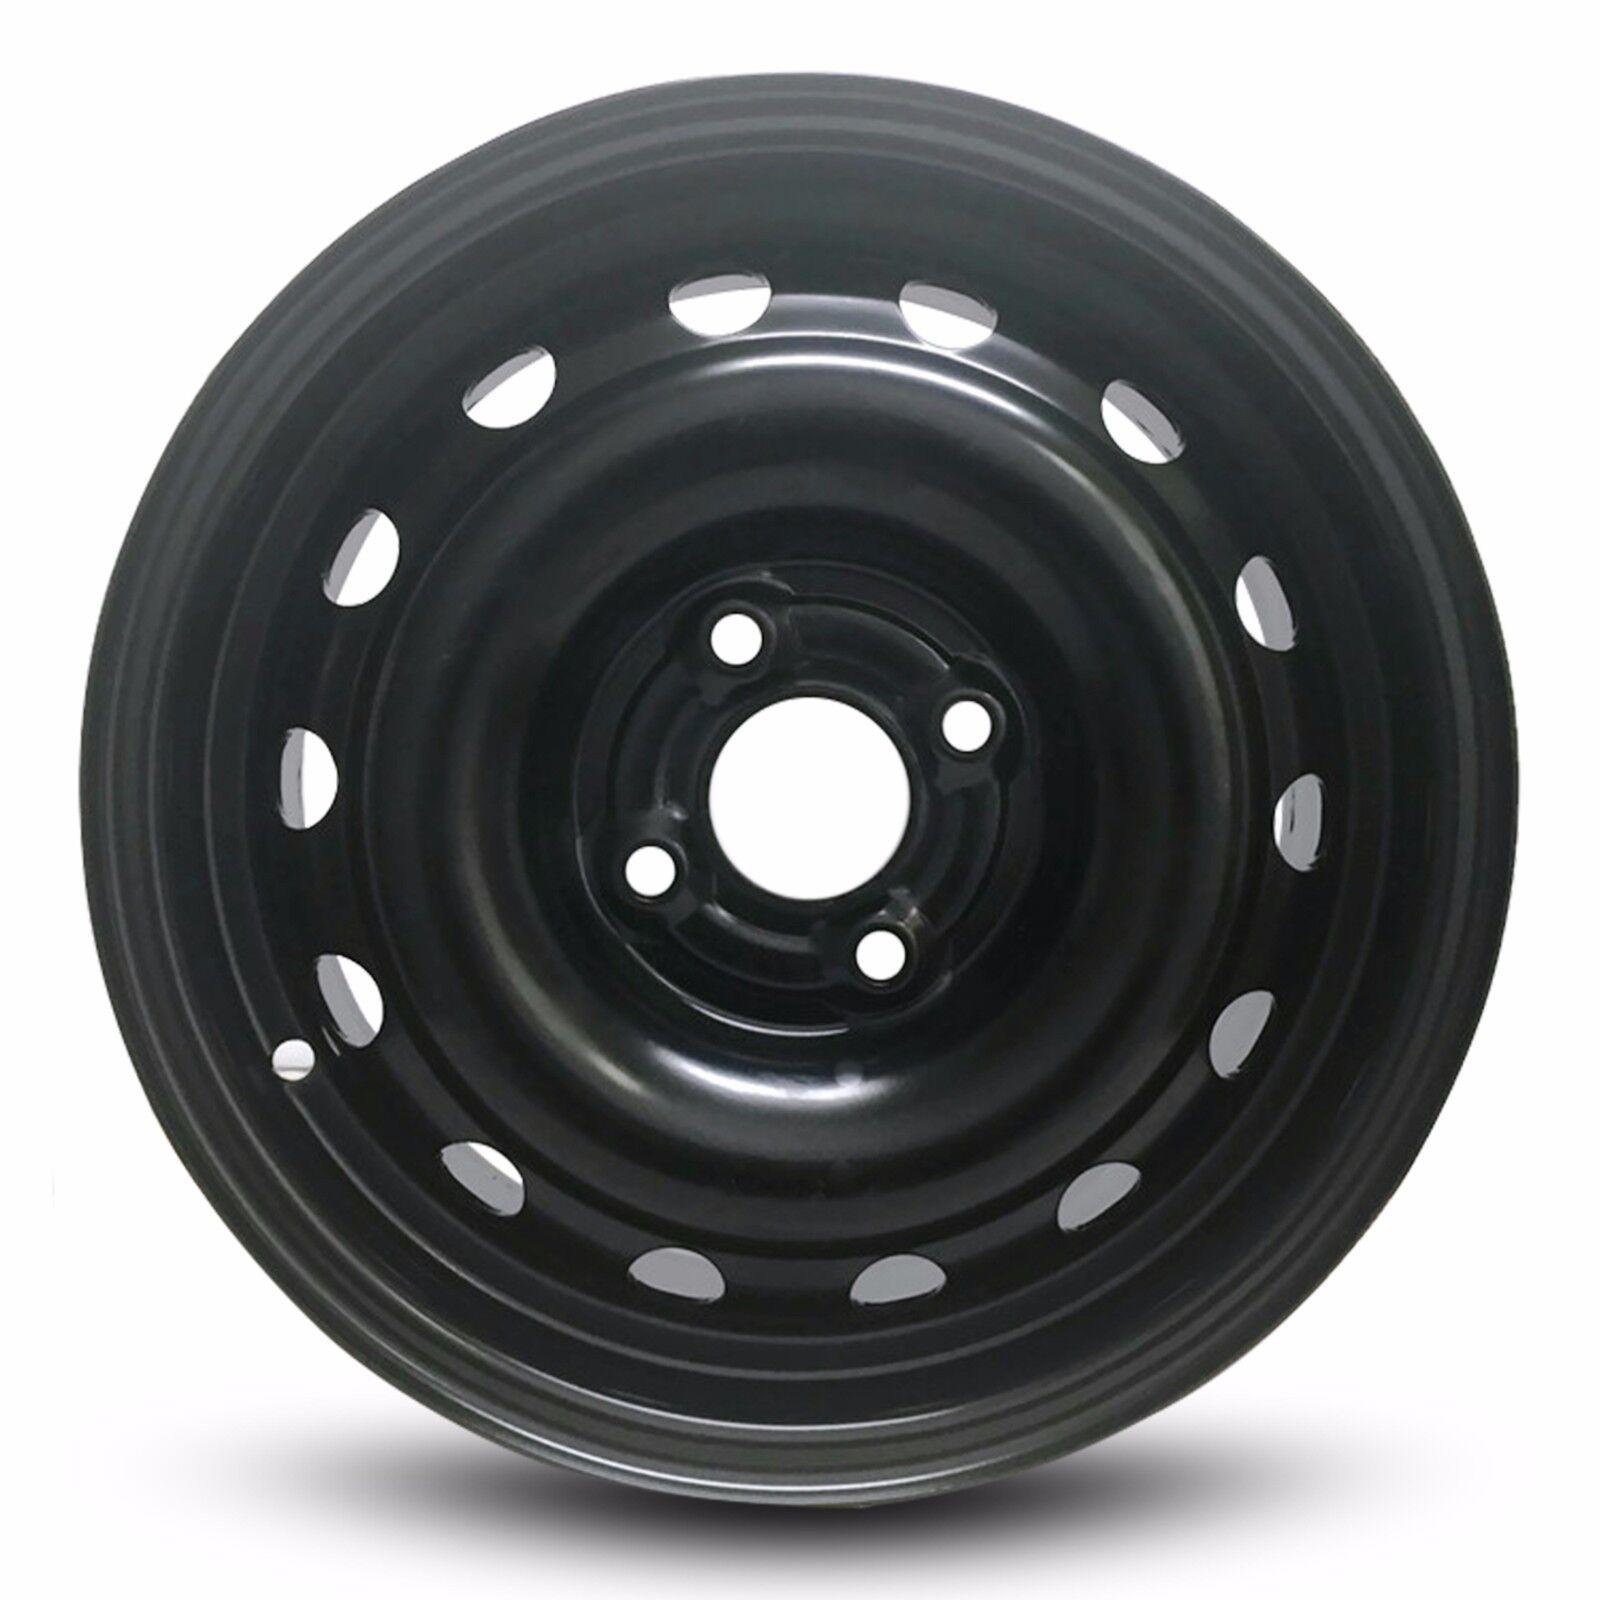 Tractor Wheel Bolt Patterns : New mitsubishi lancer inch lug steel